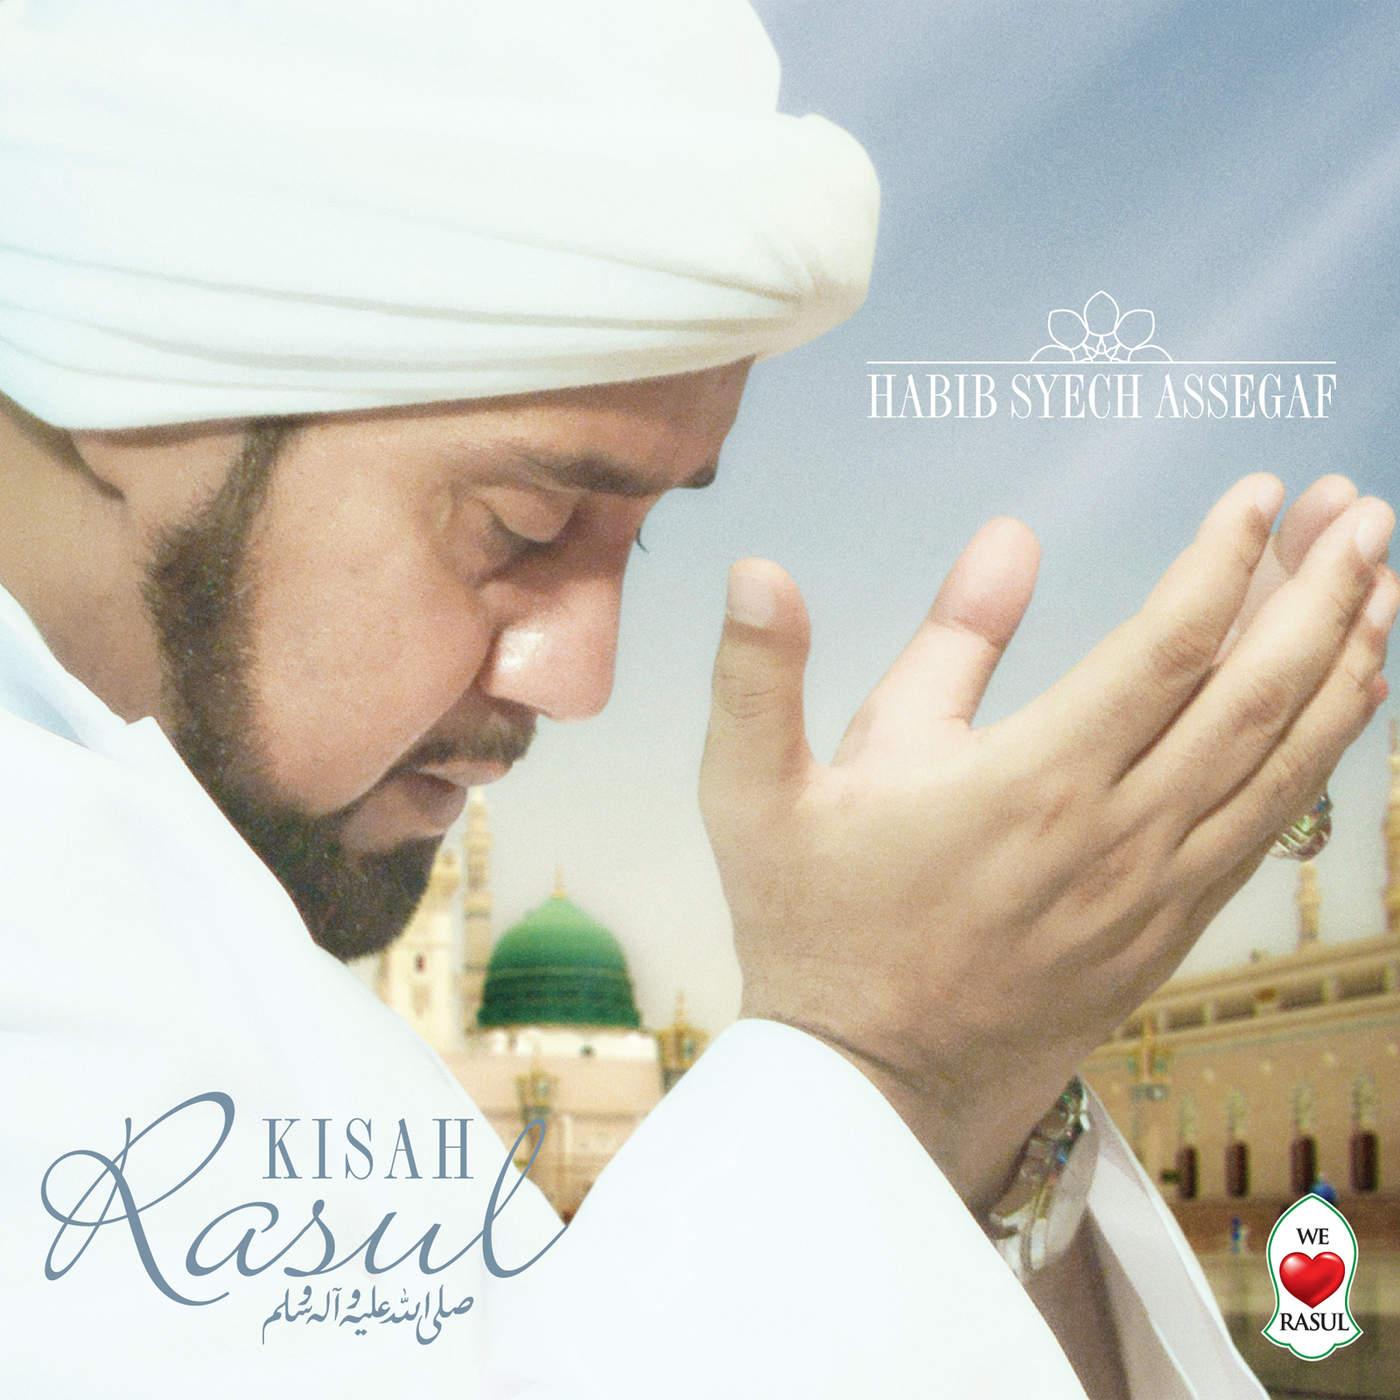 Habib Syech Assegaf - Kisah Rasul - Album (2014) [iTunes Plus AAC M4A]